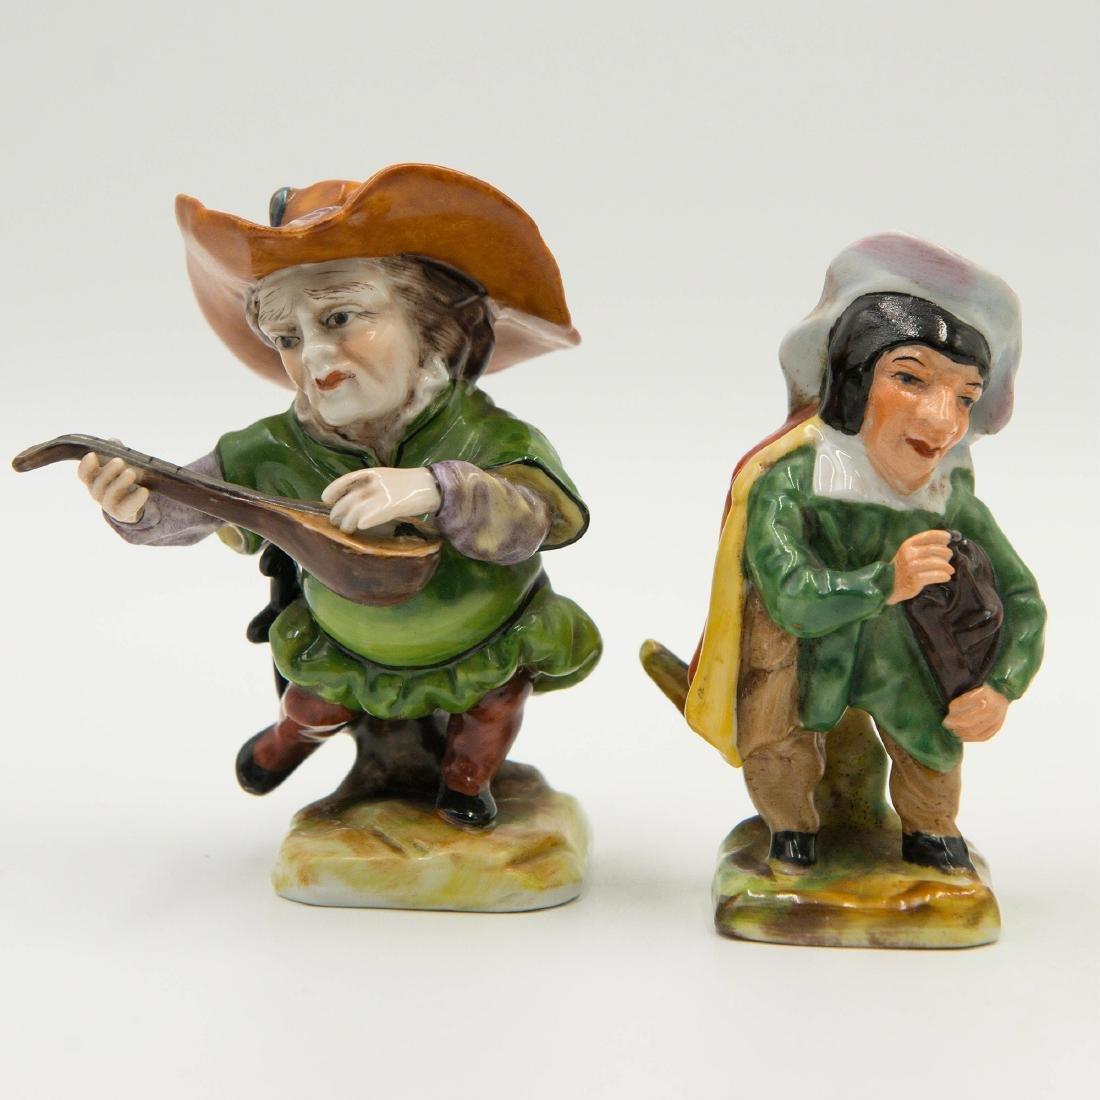 Capodimonte Porcelain Group of 4 Gnomes Dwarfs - 3